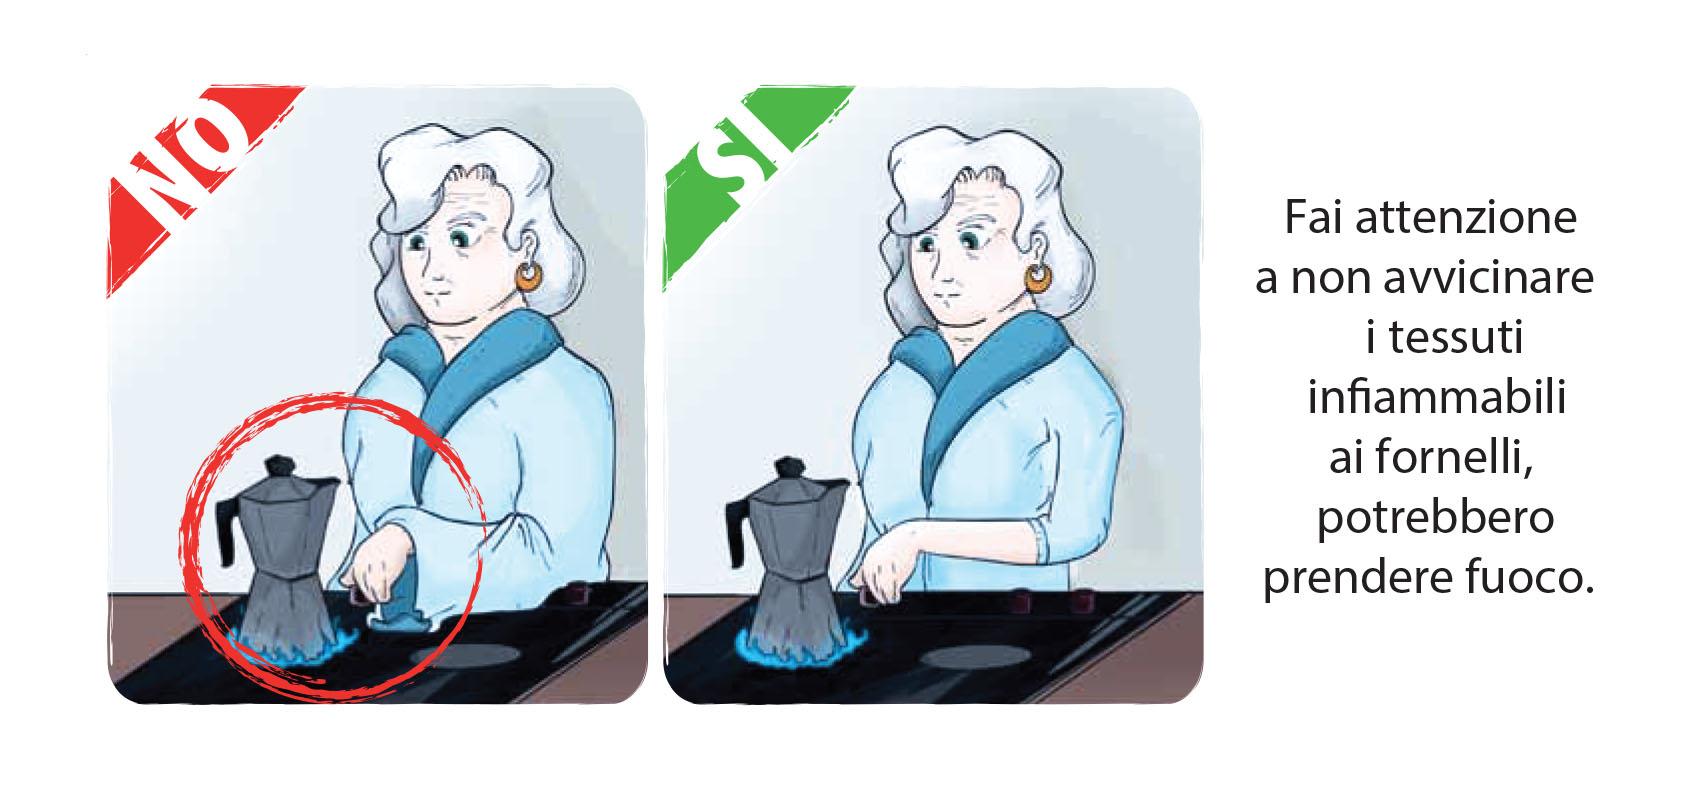 anziani-pighevole-tessuti